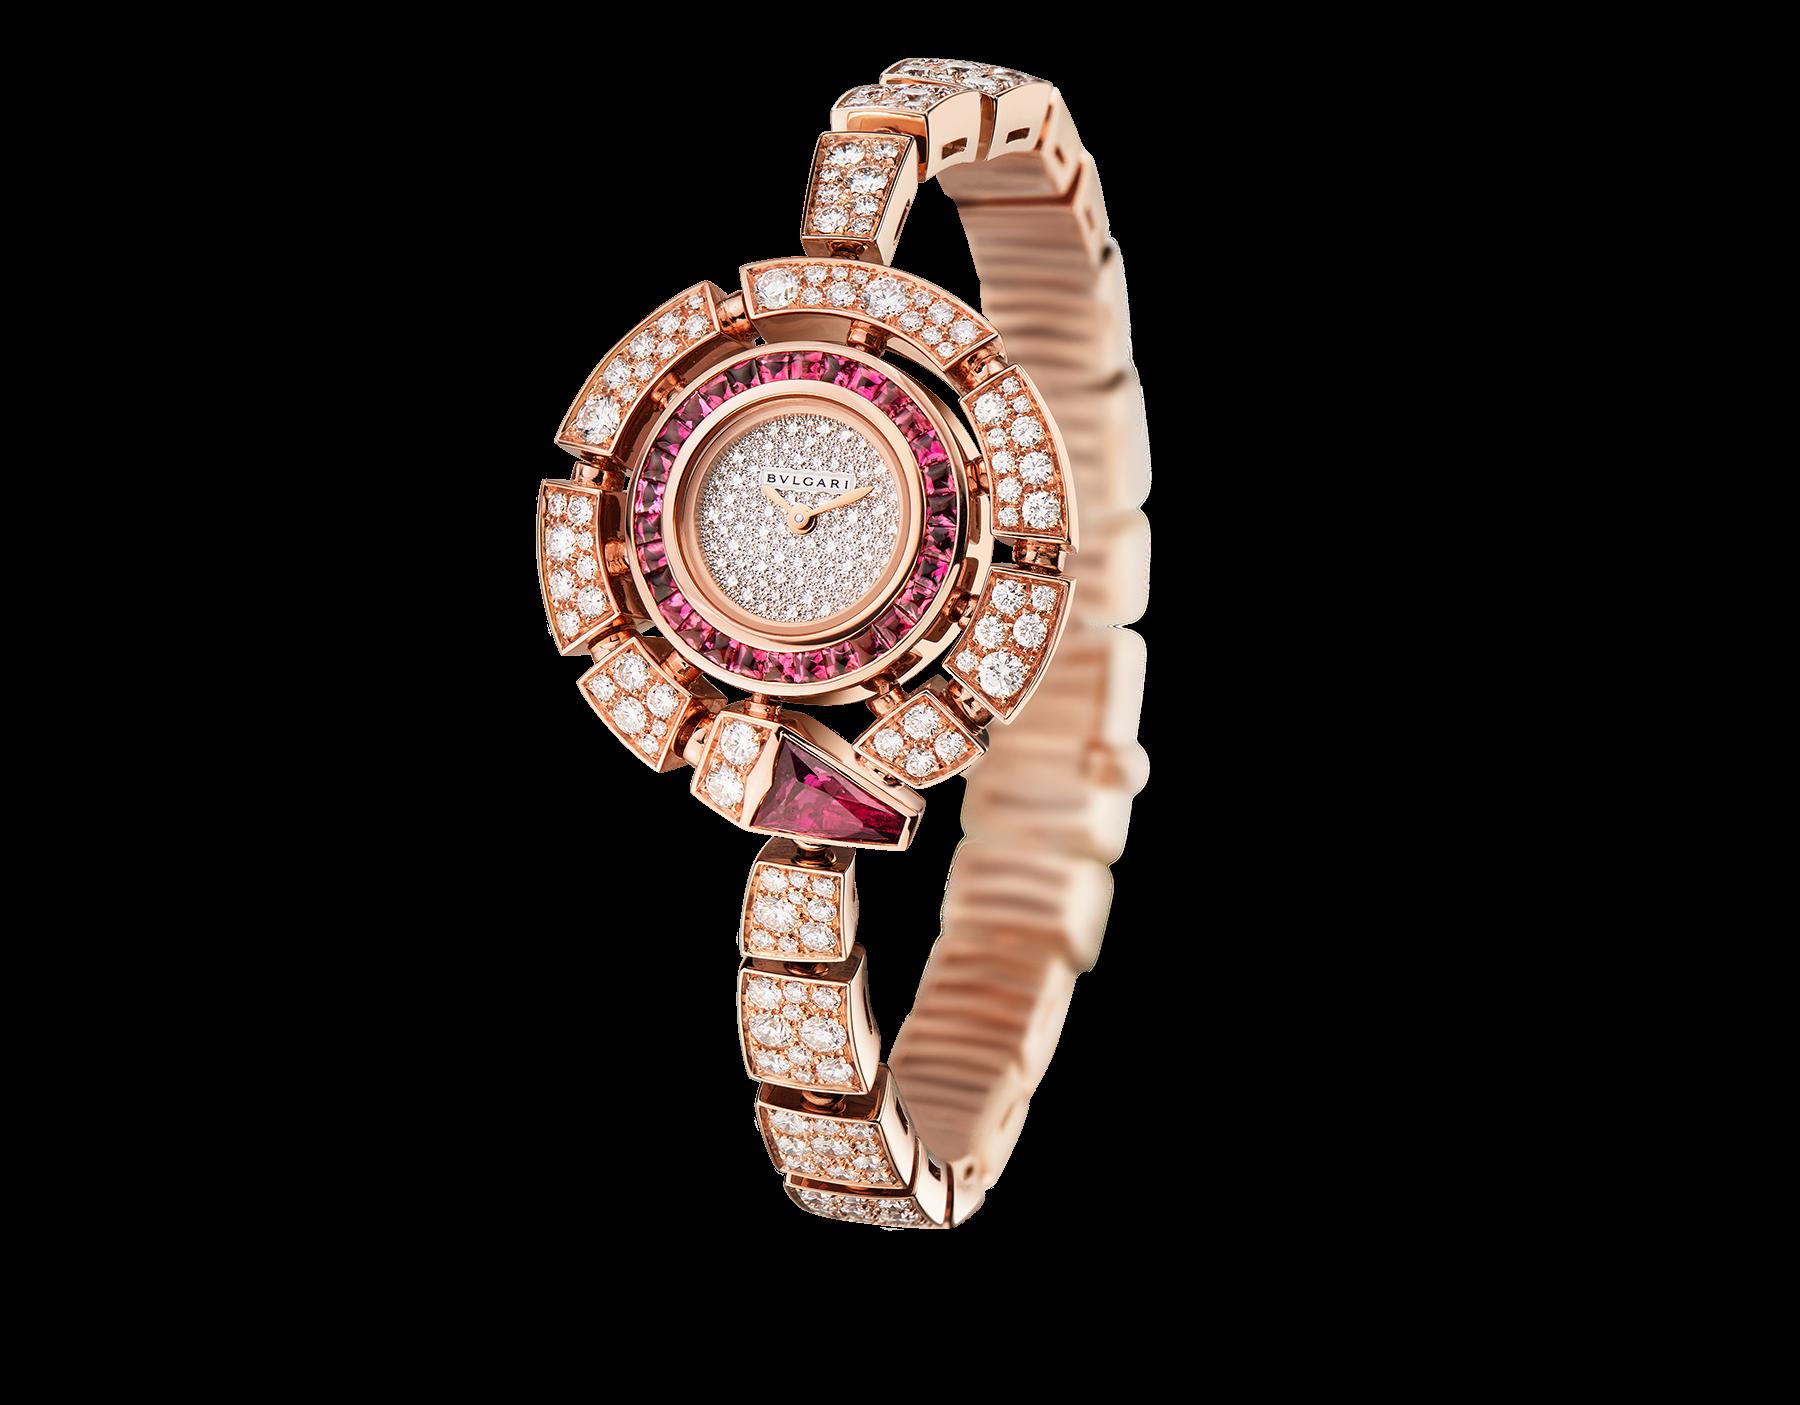 Montre Serpenti Incantati avec boîtier de 30 mm en or rose 18K serti de diamants taille brillant et rubellites, cadran pavé diamants en serti «neige», bracelet en or rose 18K serti de diamants taille brillant. 102536 image 1